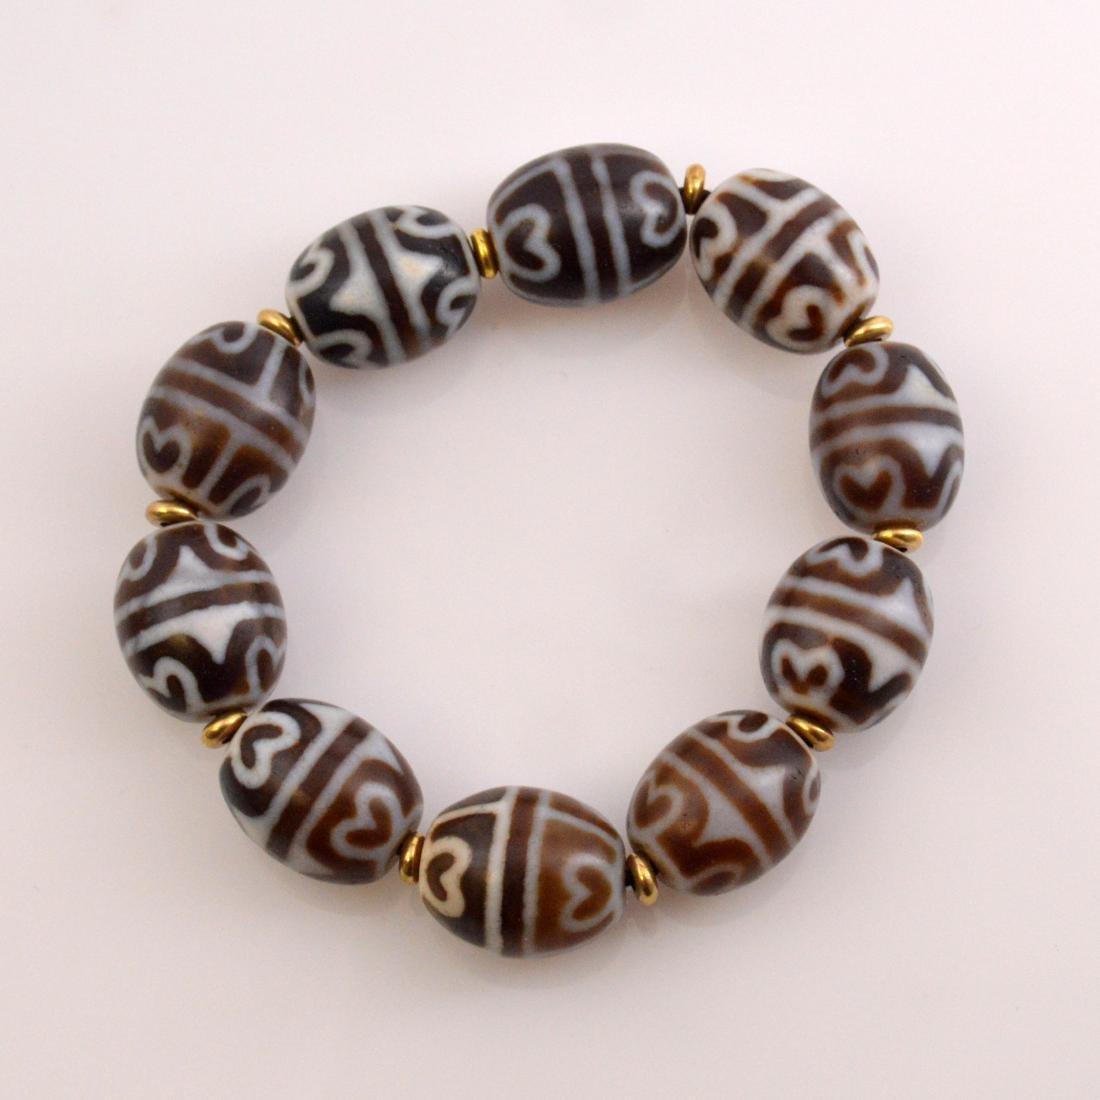 Lotus Dzi Bead Bracelet